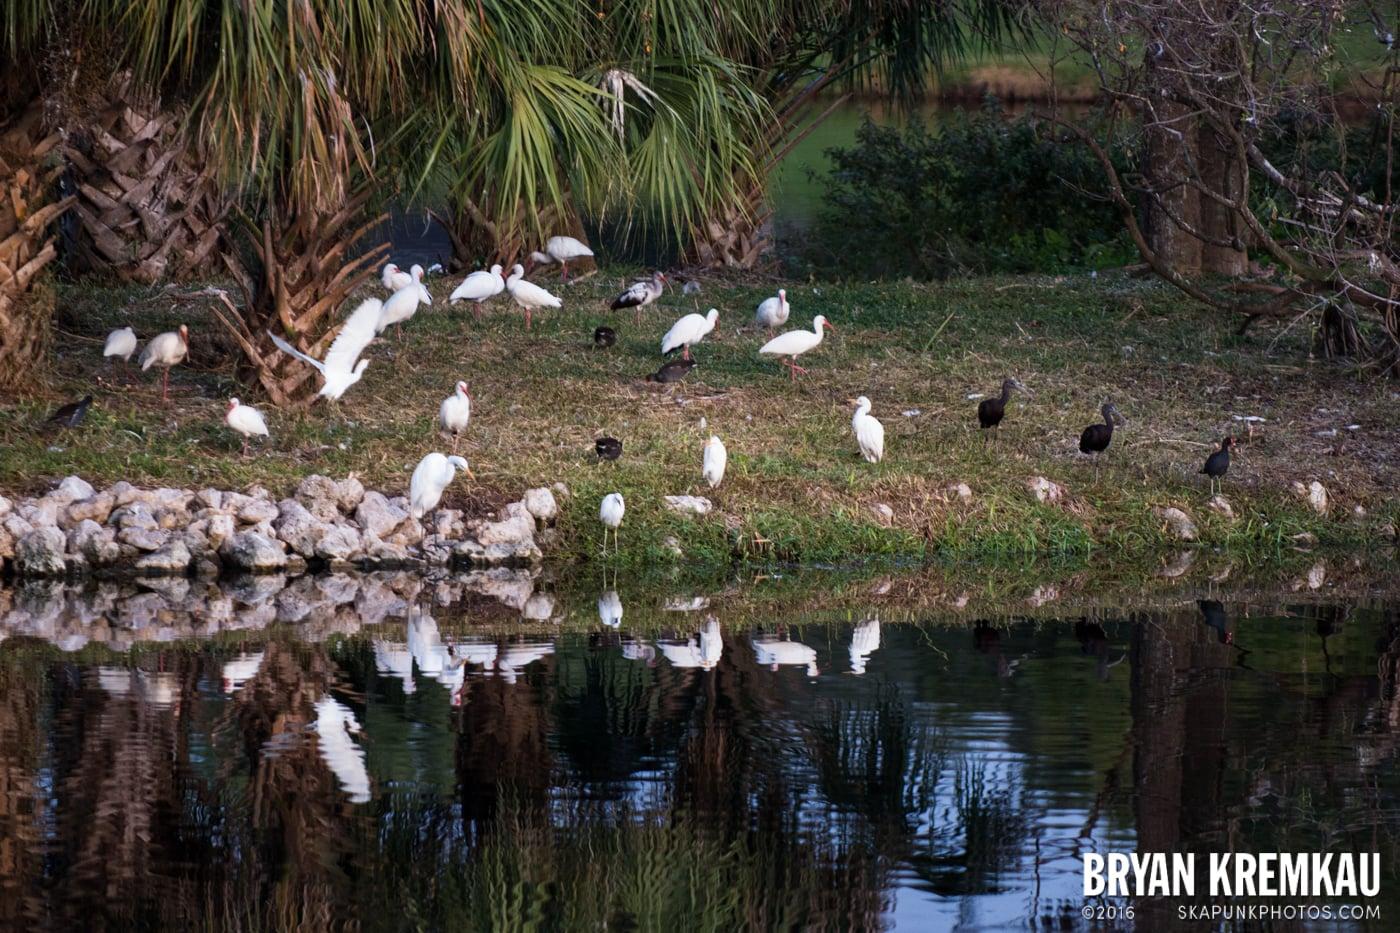 Sunsets, Astrophotography & Birds @ Venice, Florida - 10.25.14 - 11.5.14 (25)